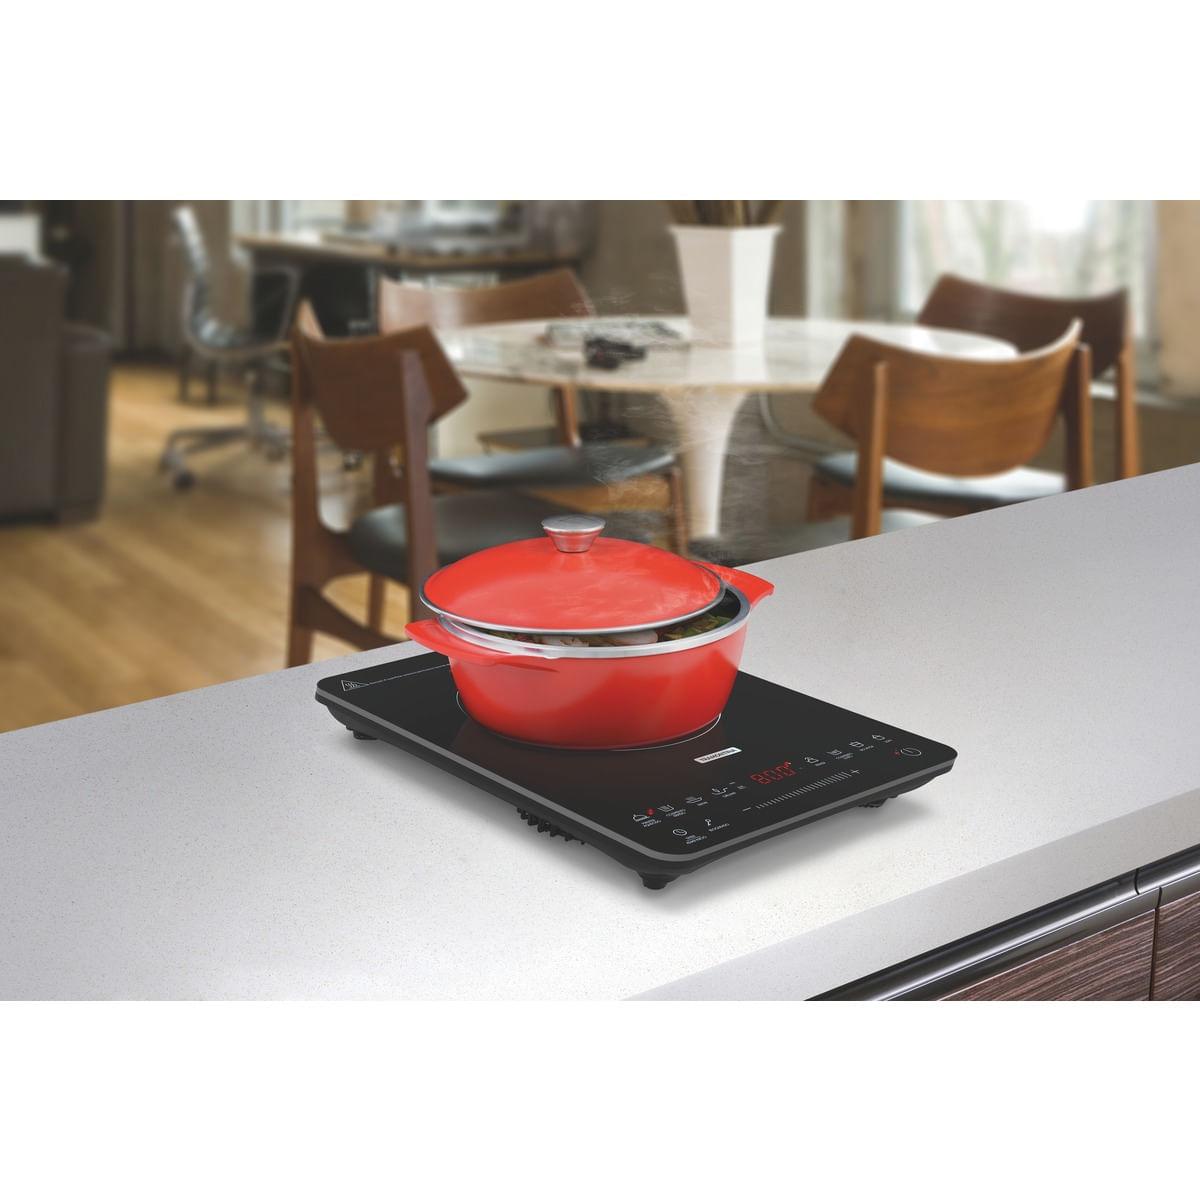 Cooktop Portátil por Indução Tramontina Slim Touch 127 V 94714131